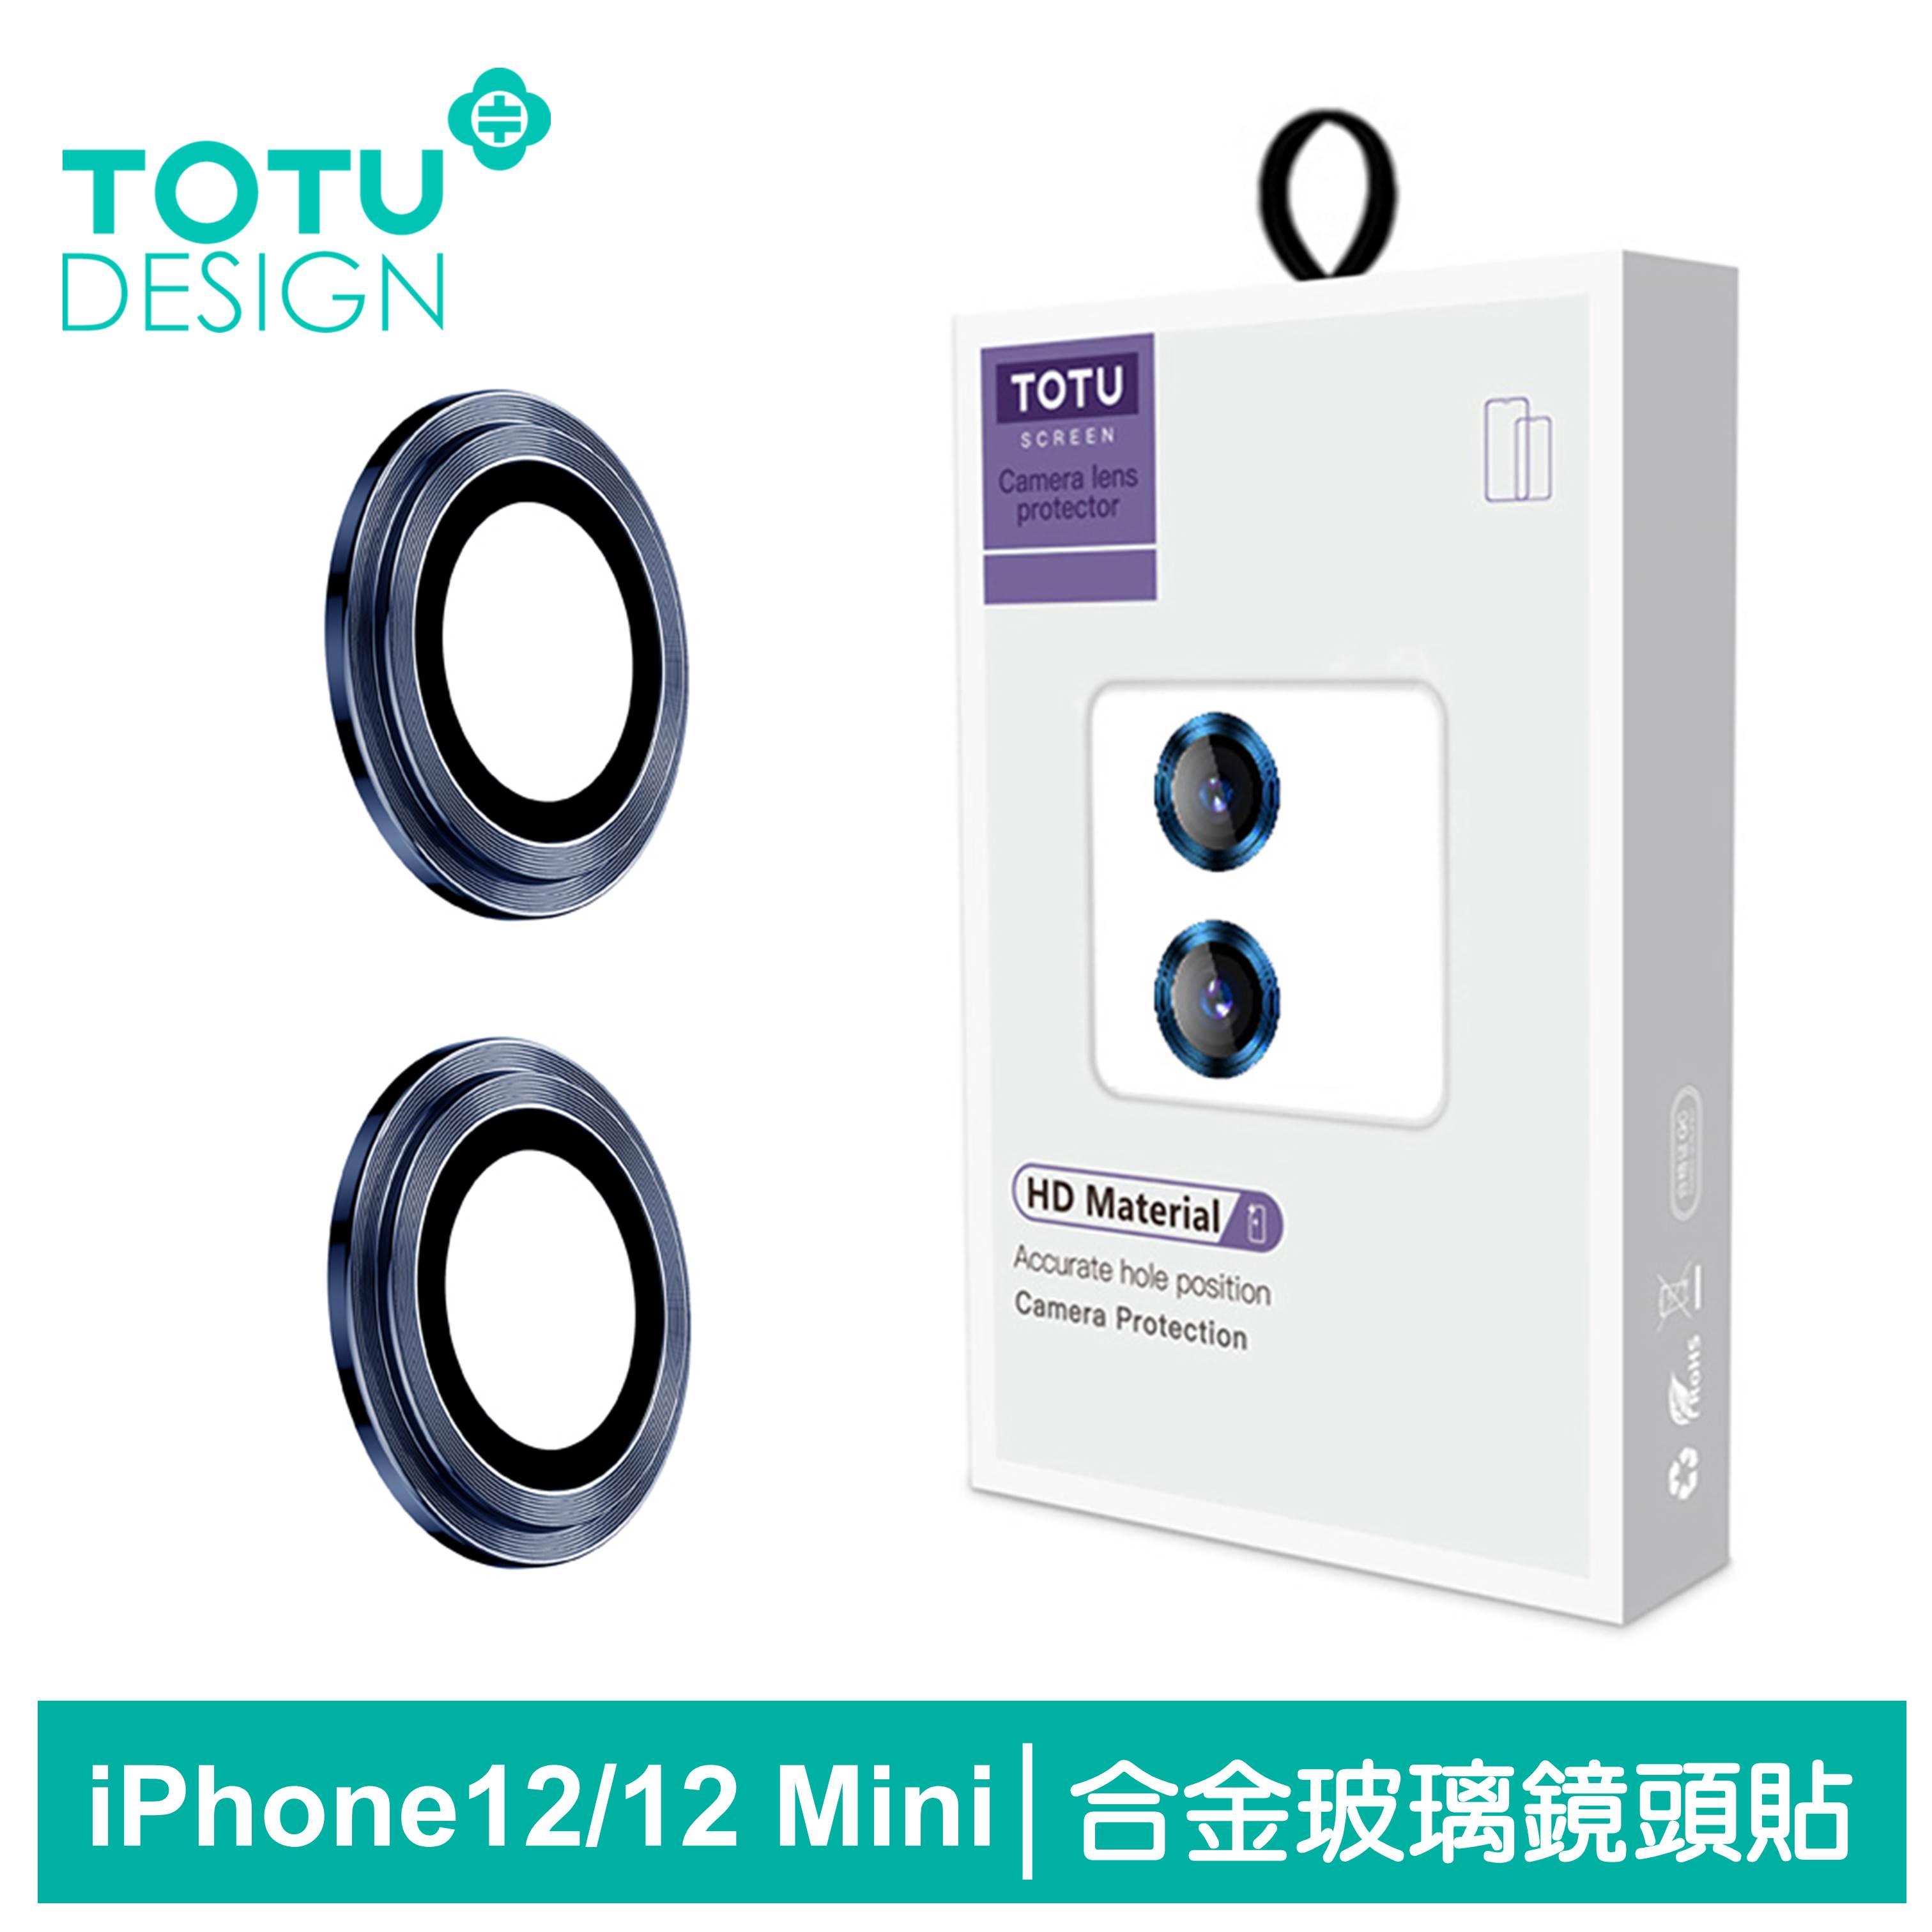 TOTU台灣官方 iPhone 12 /12 Mini 鏡頭貼 i12 Mini 鋼化膜 保護貼 鋁合金鋼化玻璃 金盾系列 藍色